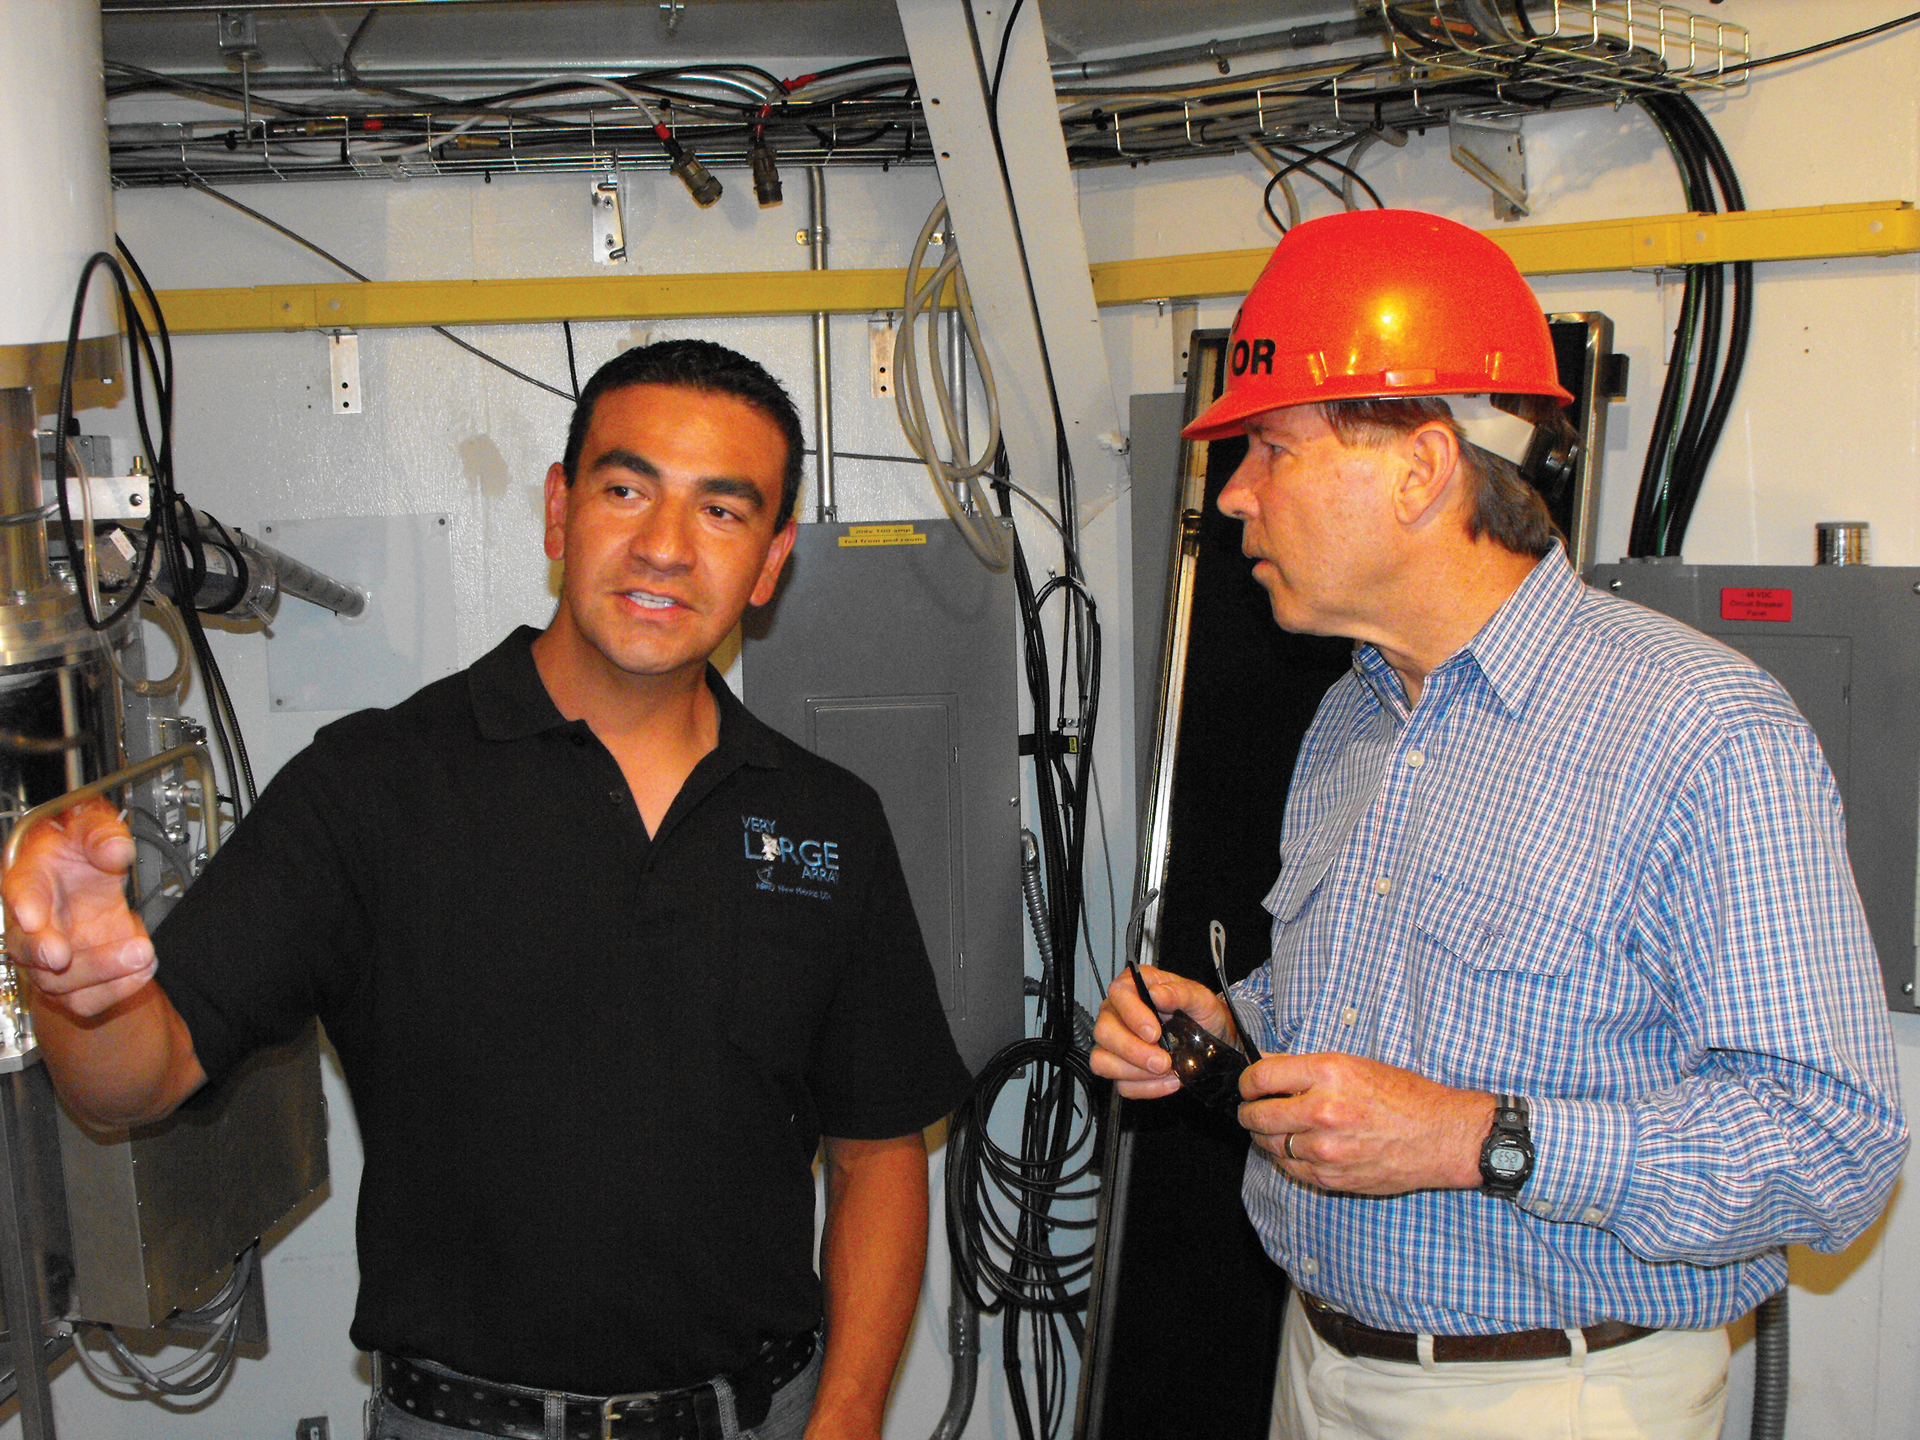 U.S. Senator Tom Udall and NRAO employee Eric Chavez